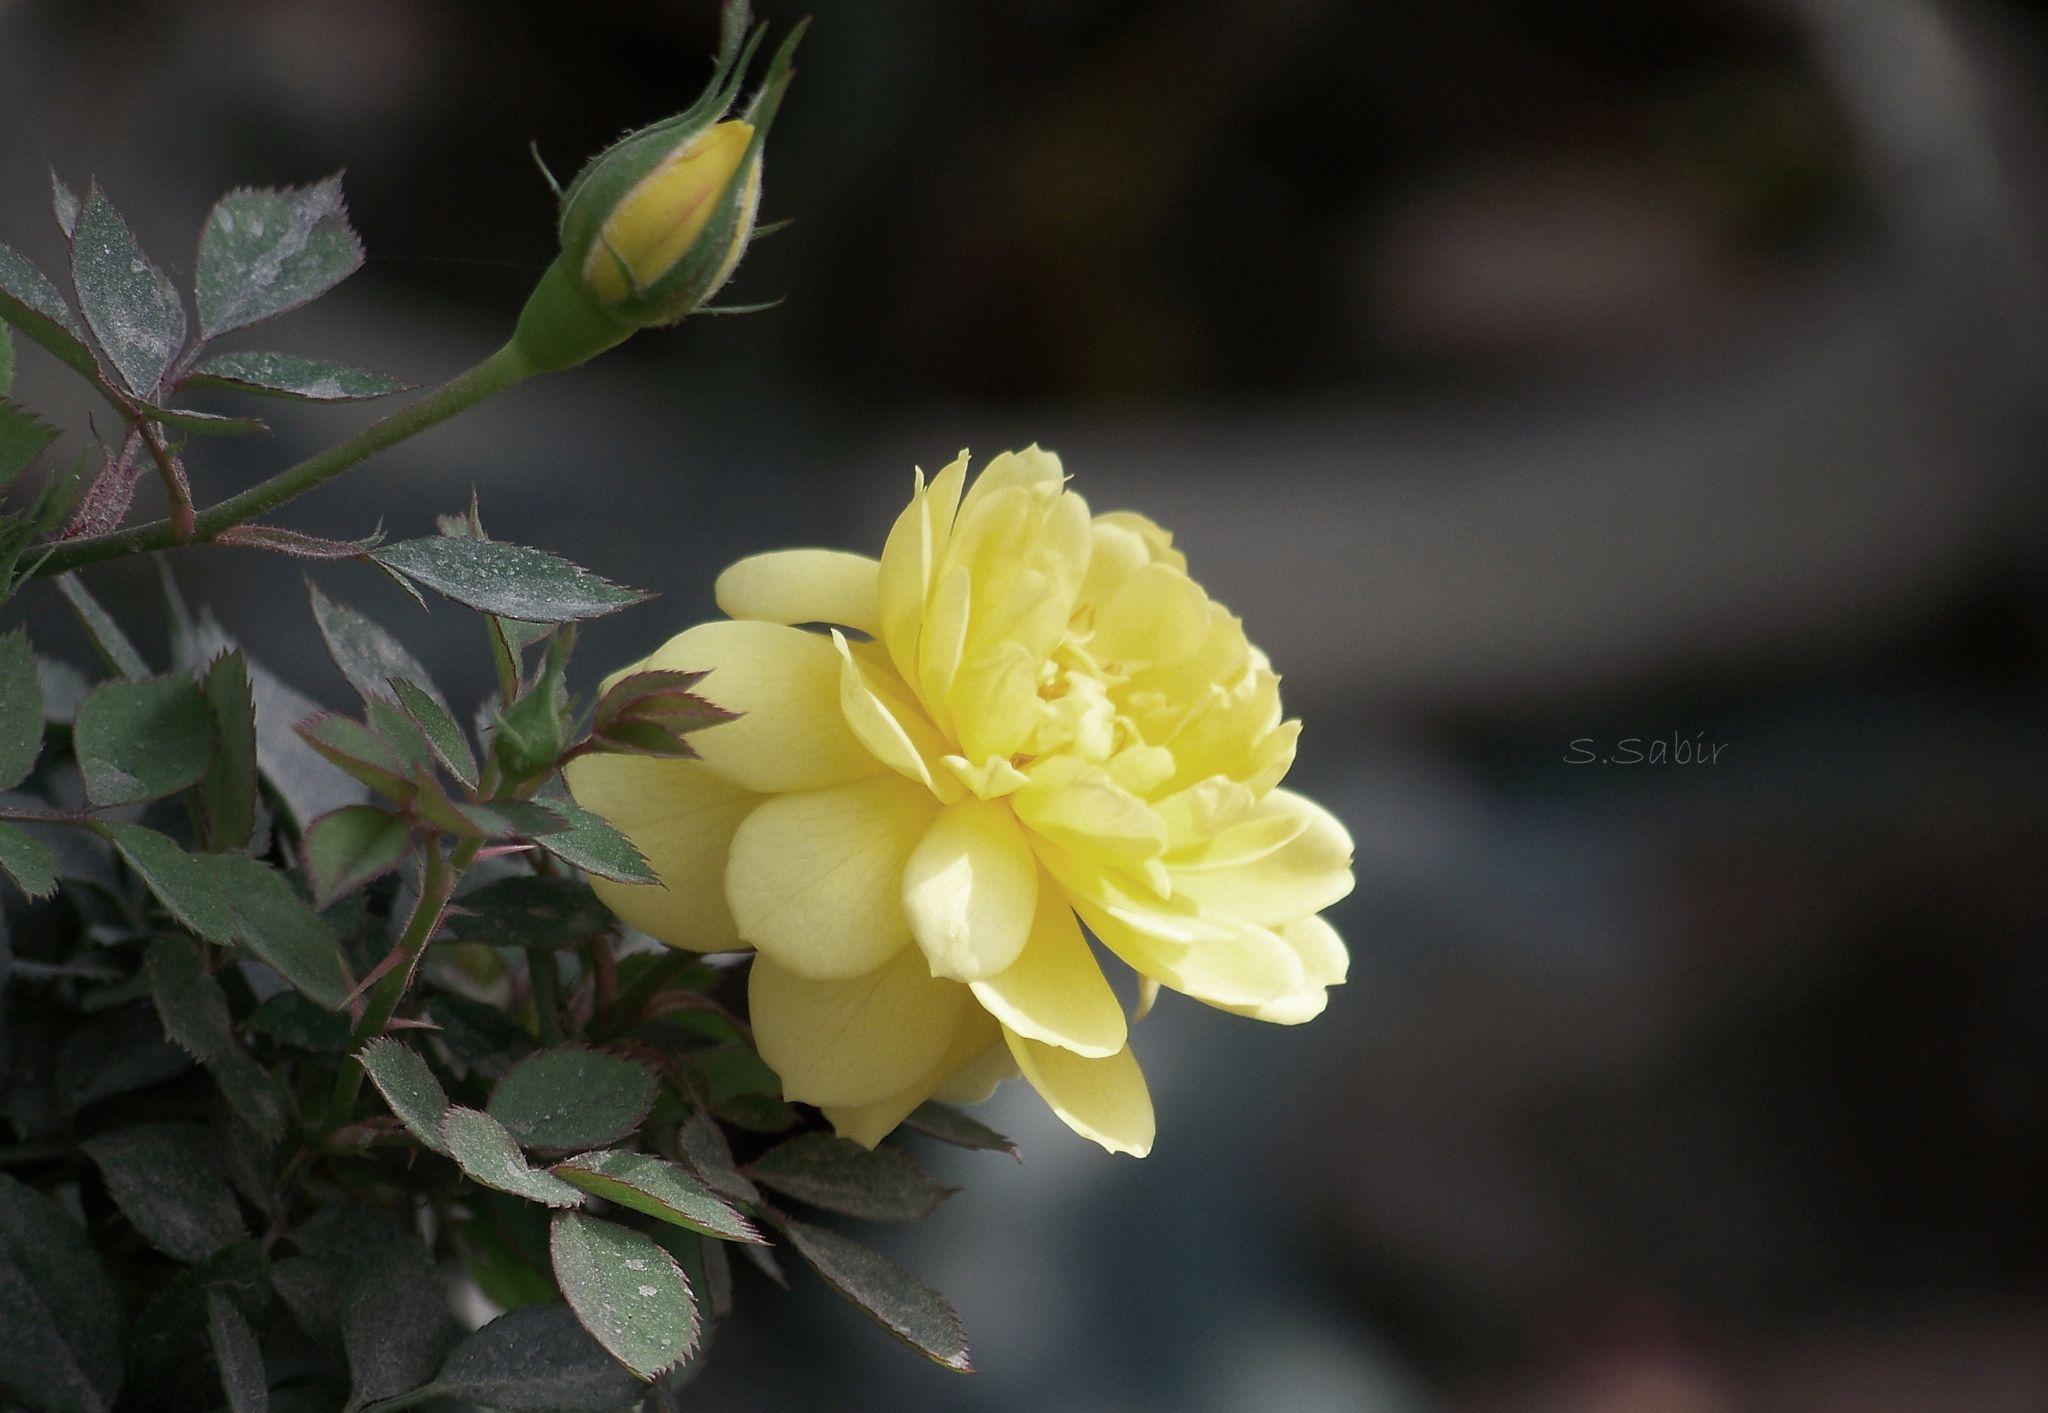 Yellow Rose by SaimoomSabir